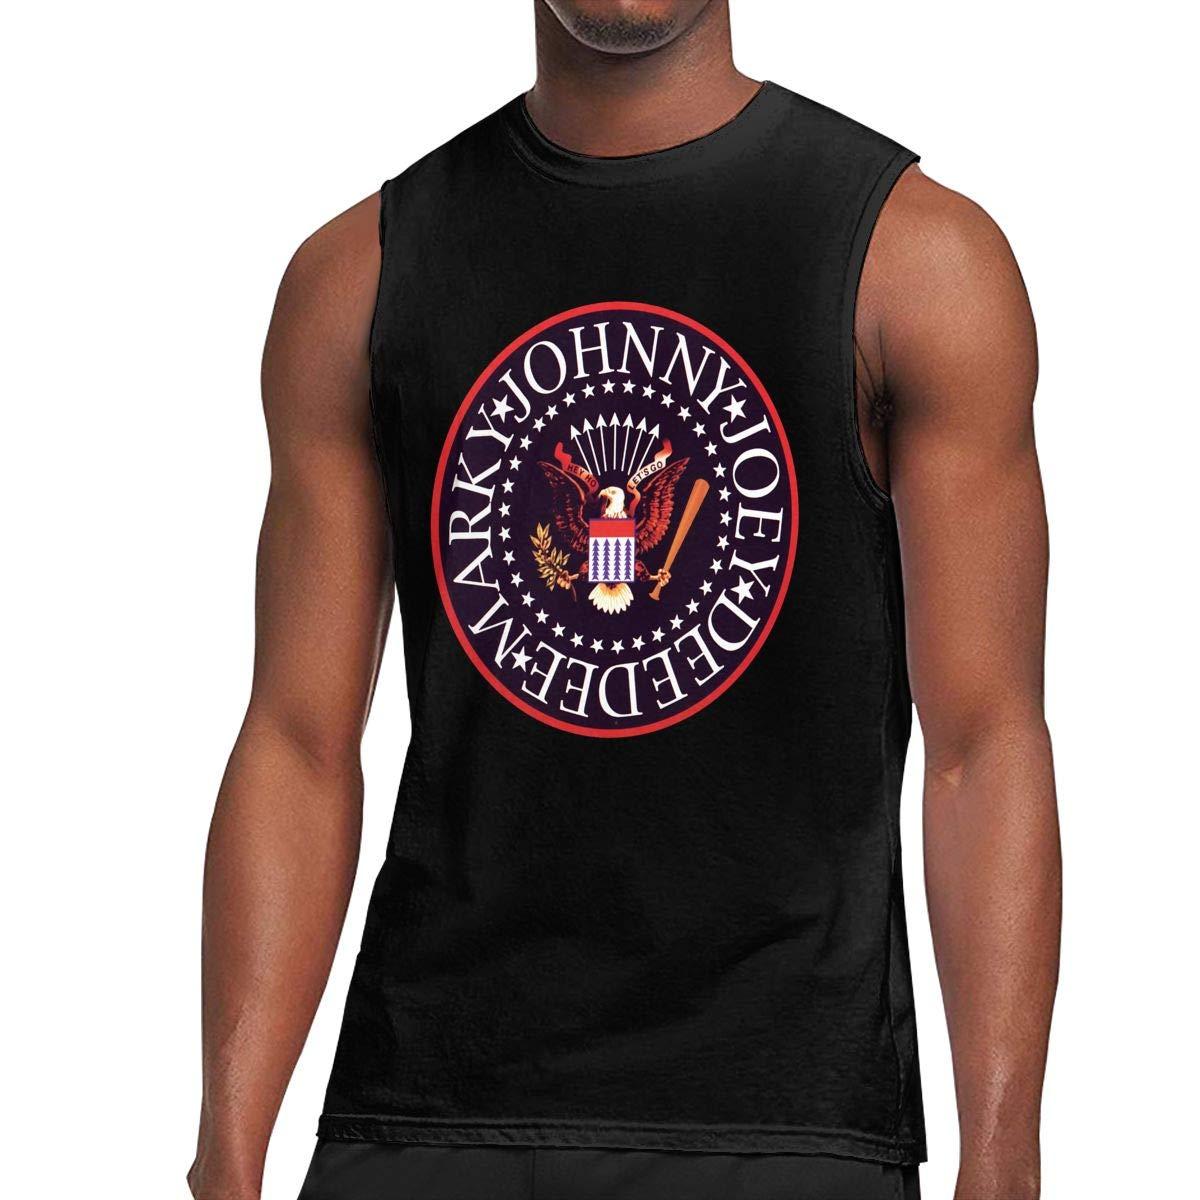 Deborah E Freeman Ramones T Shirts Sleeveless Round Neck Tank Top T Shirt 1152